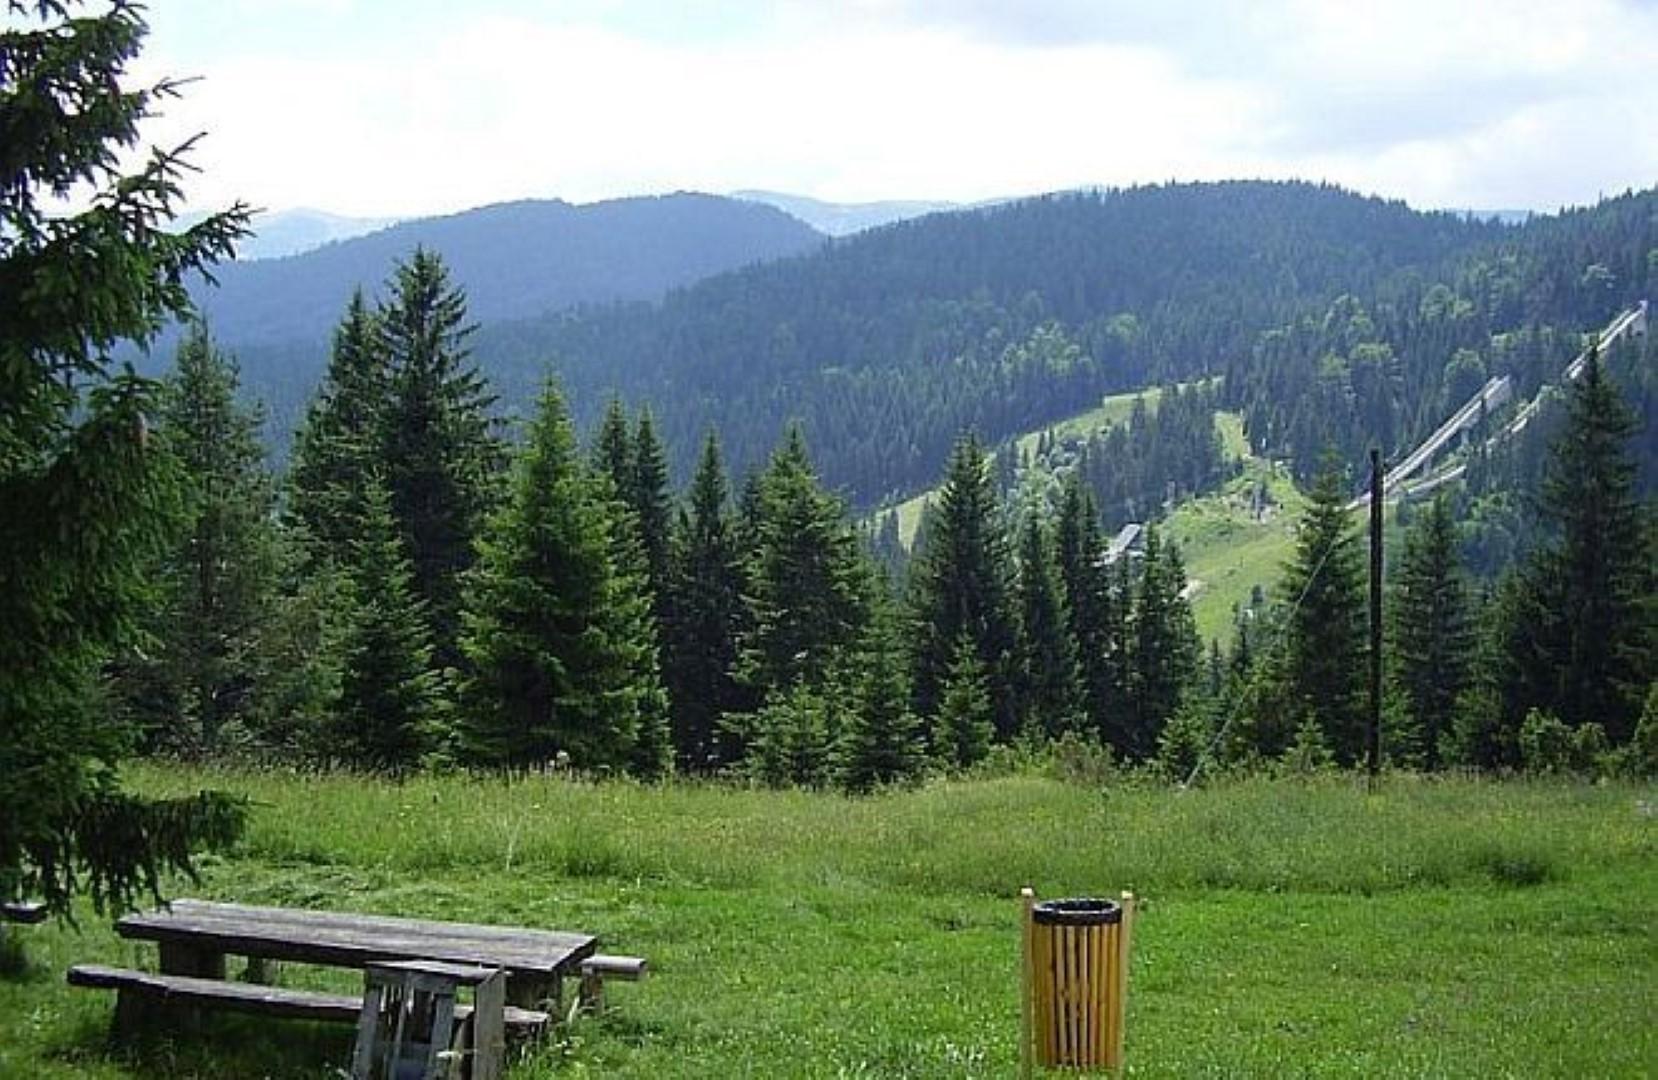 bosnia tourism